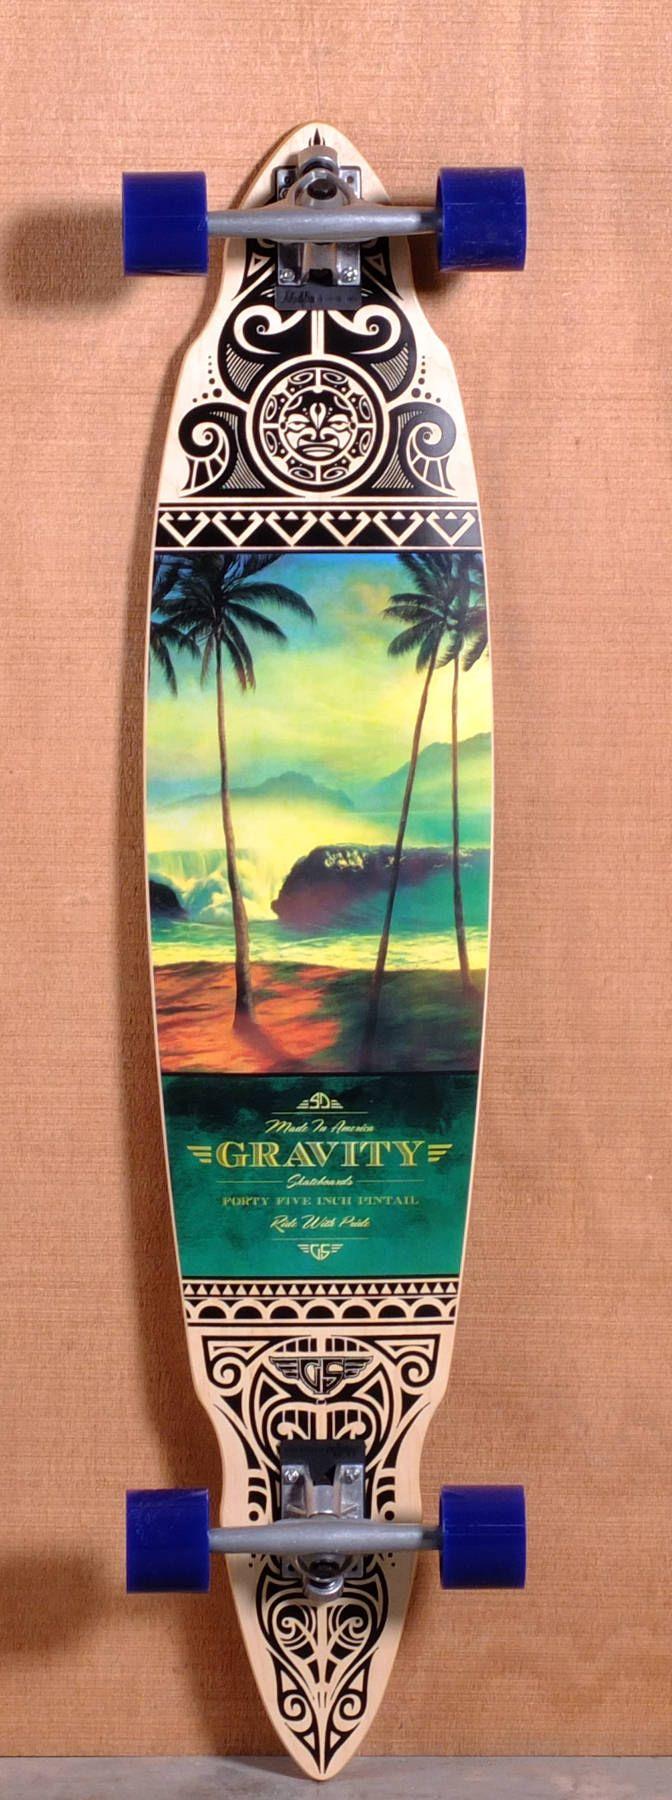 "Gravity 45"" Pintail Longboard Complete - Tres Palmas"